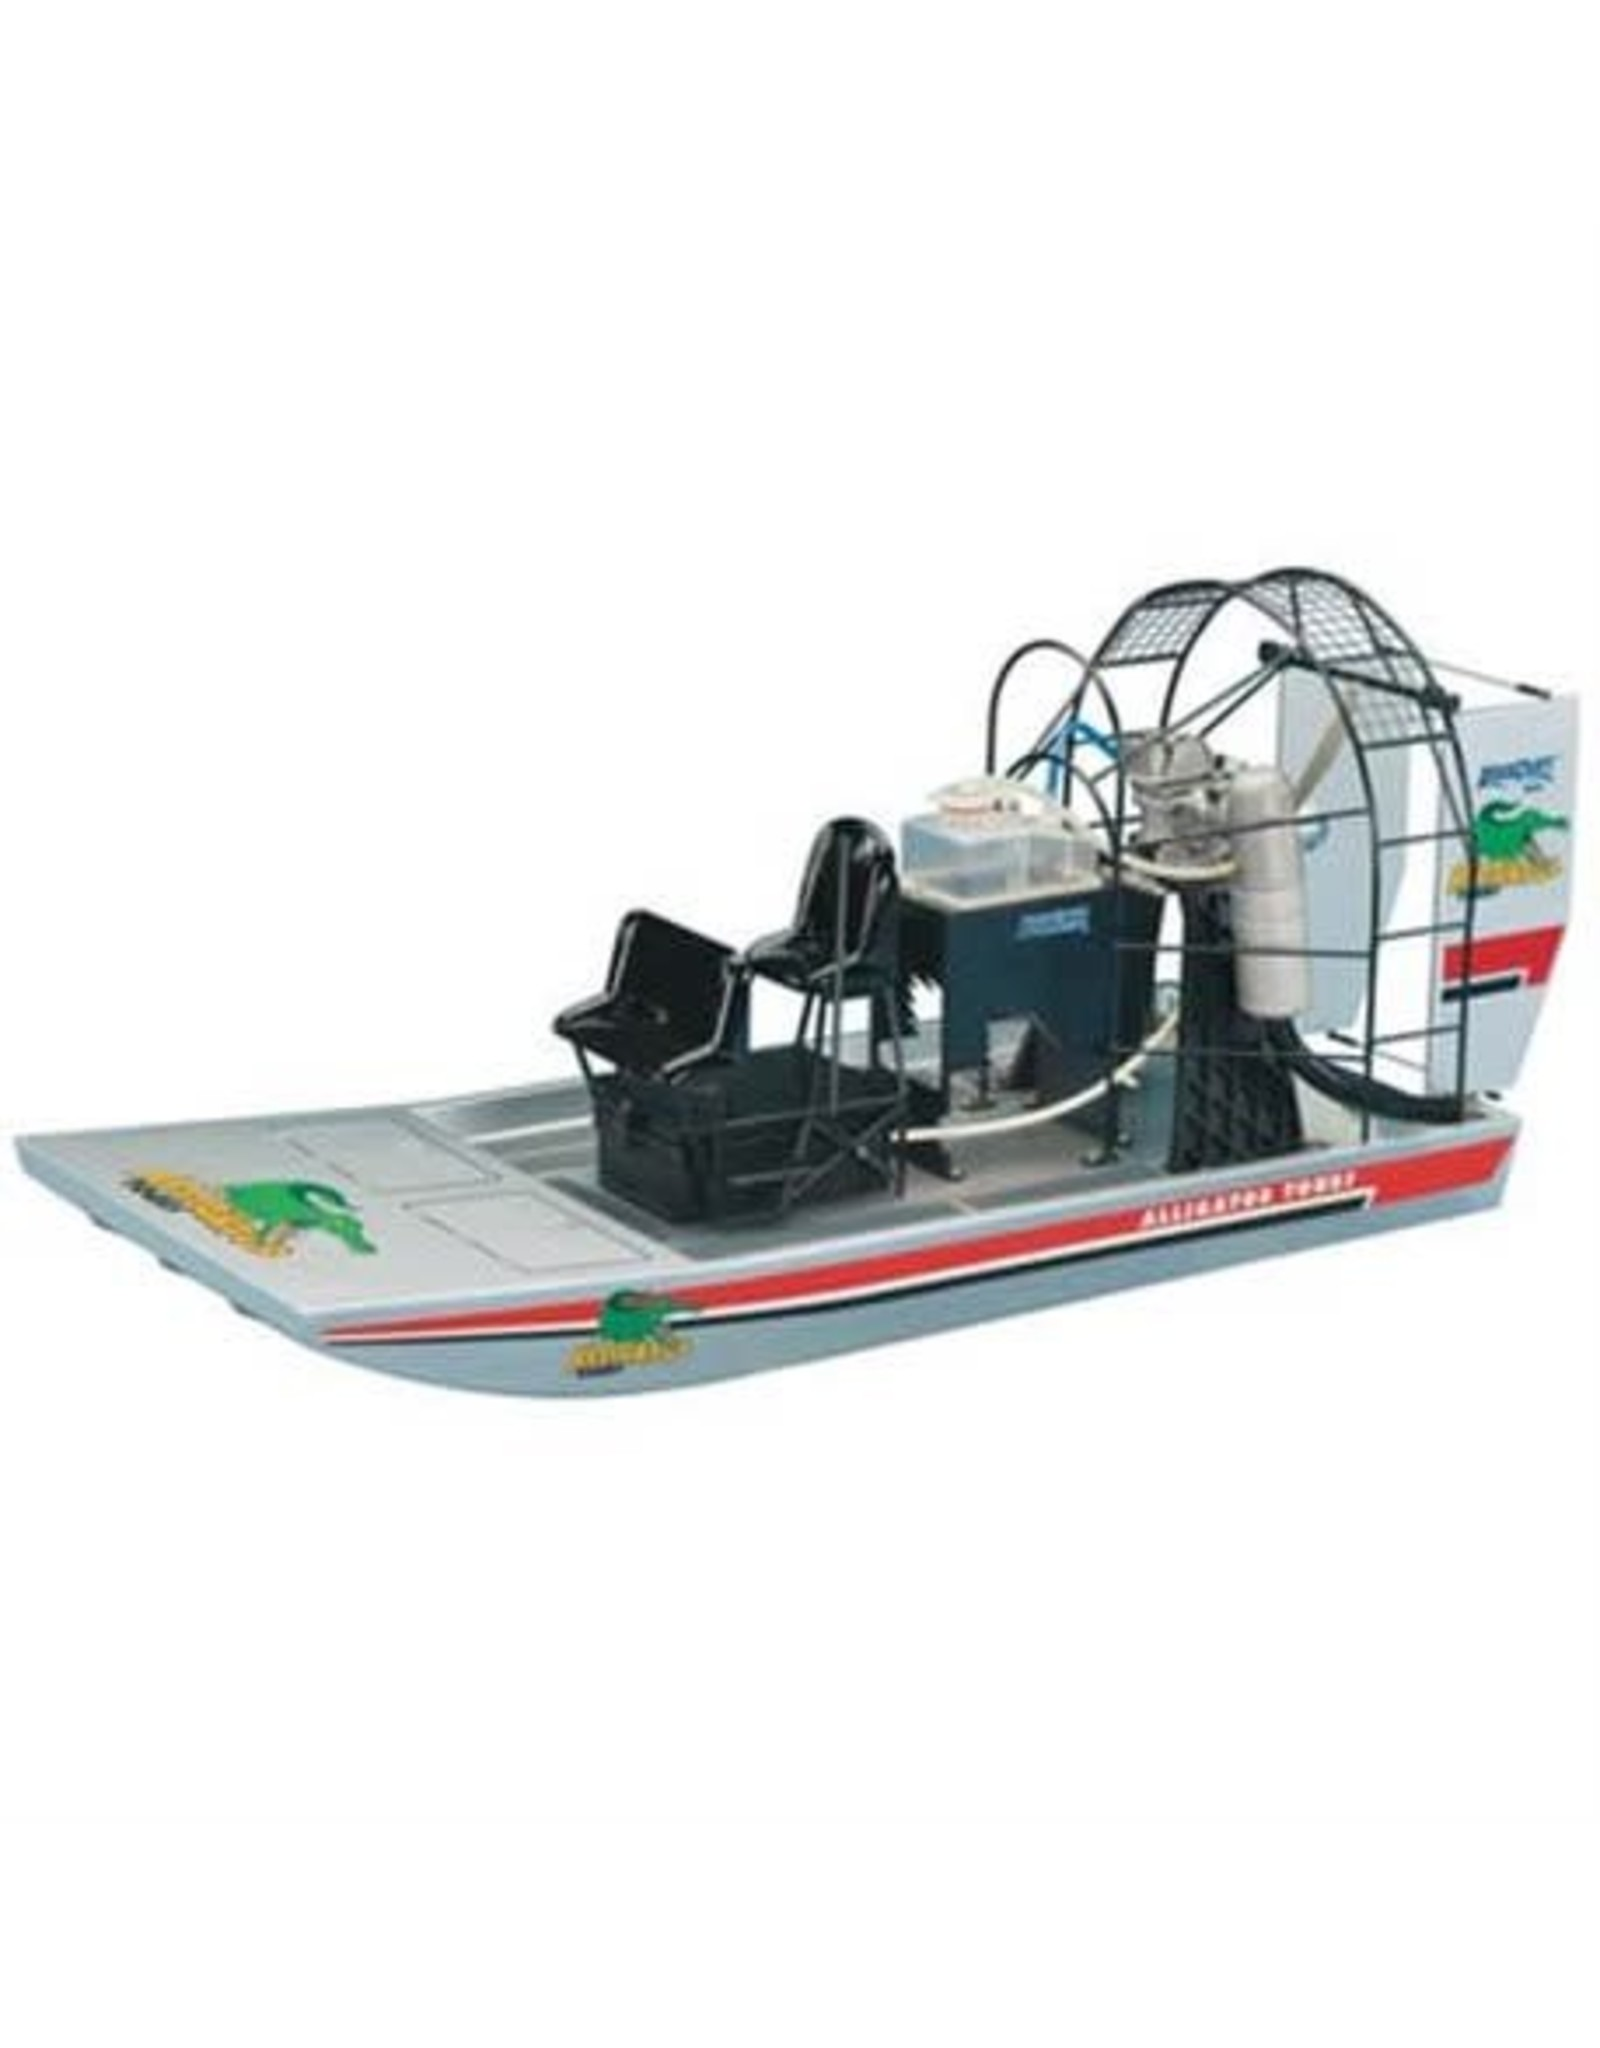 AquaCraft Alligator Tours Airboat TTX300 2.4GHz RTR